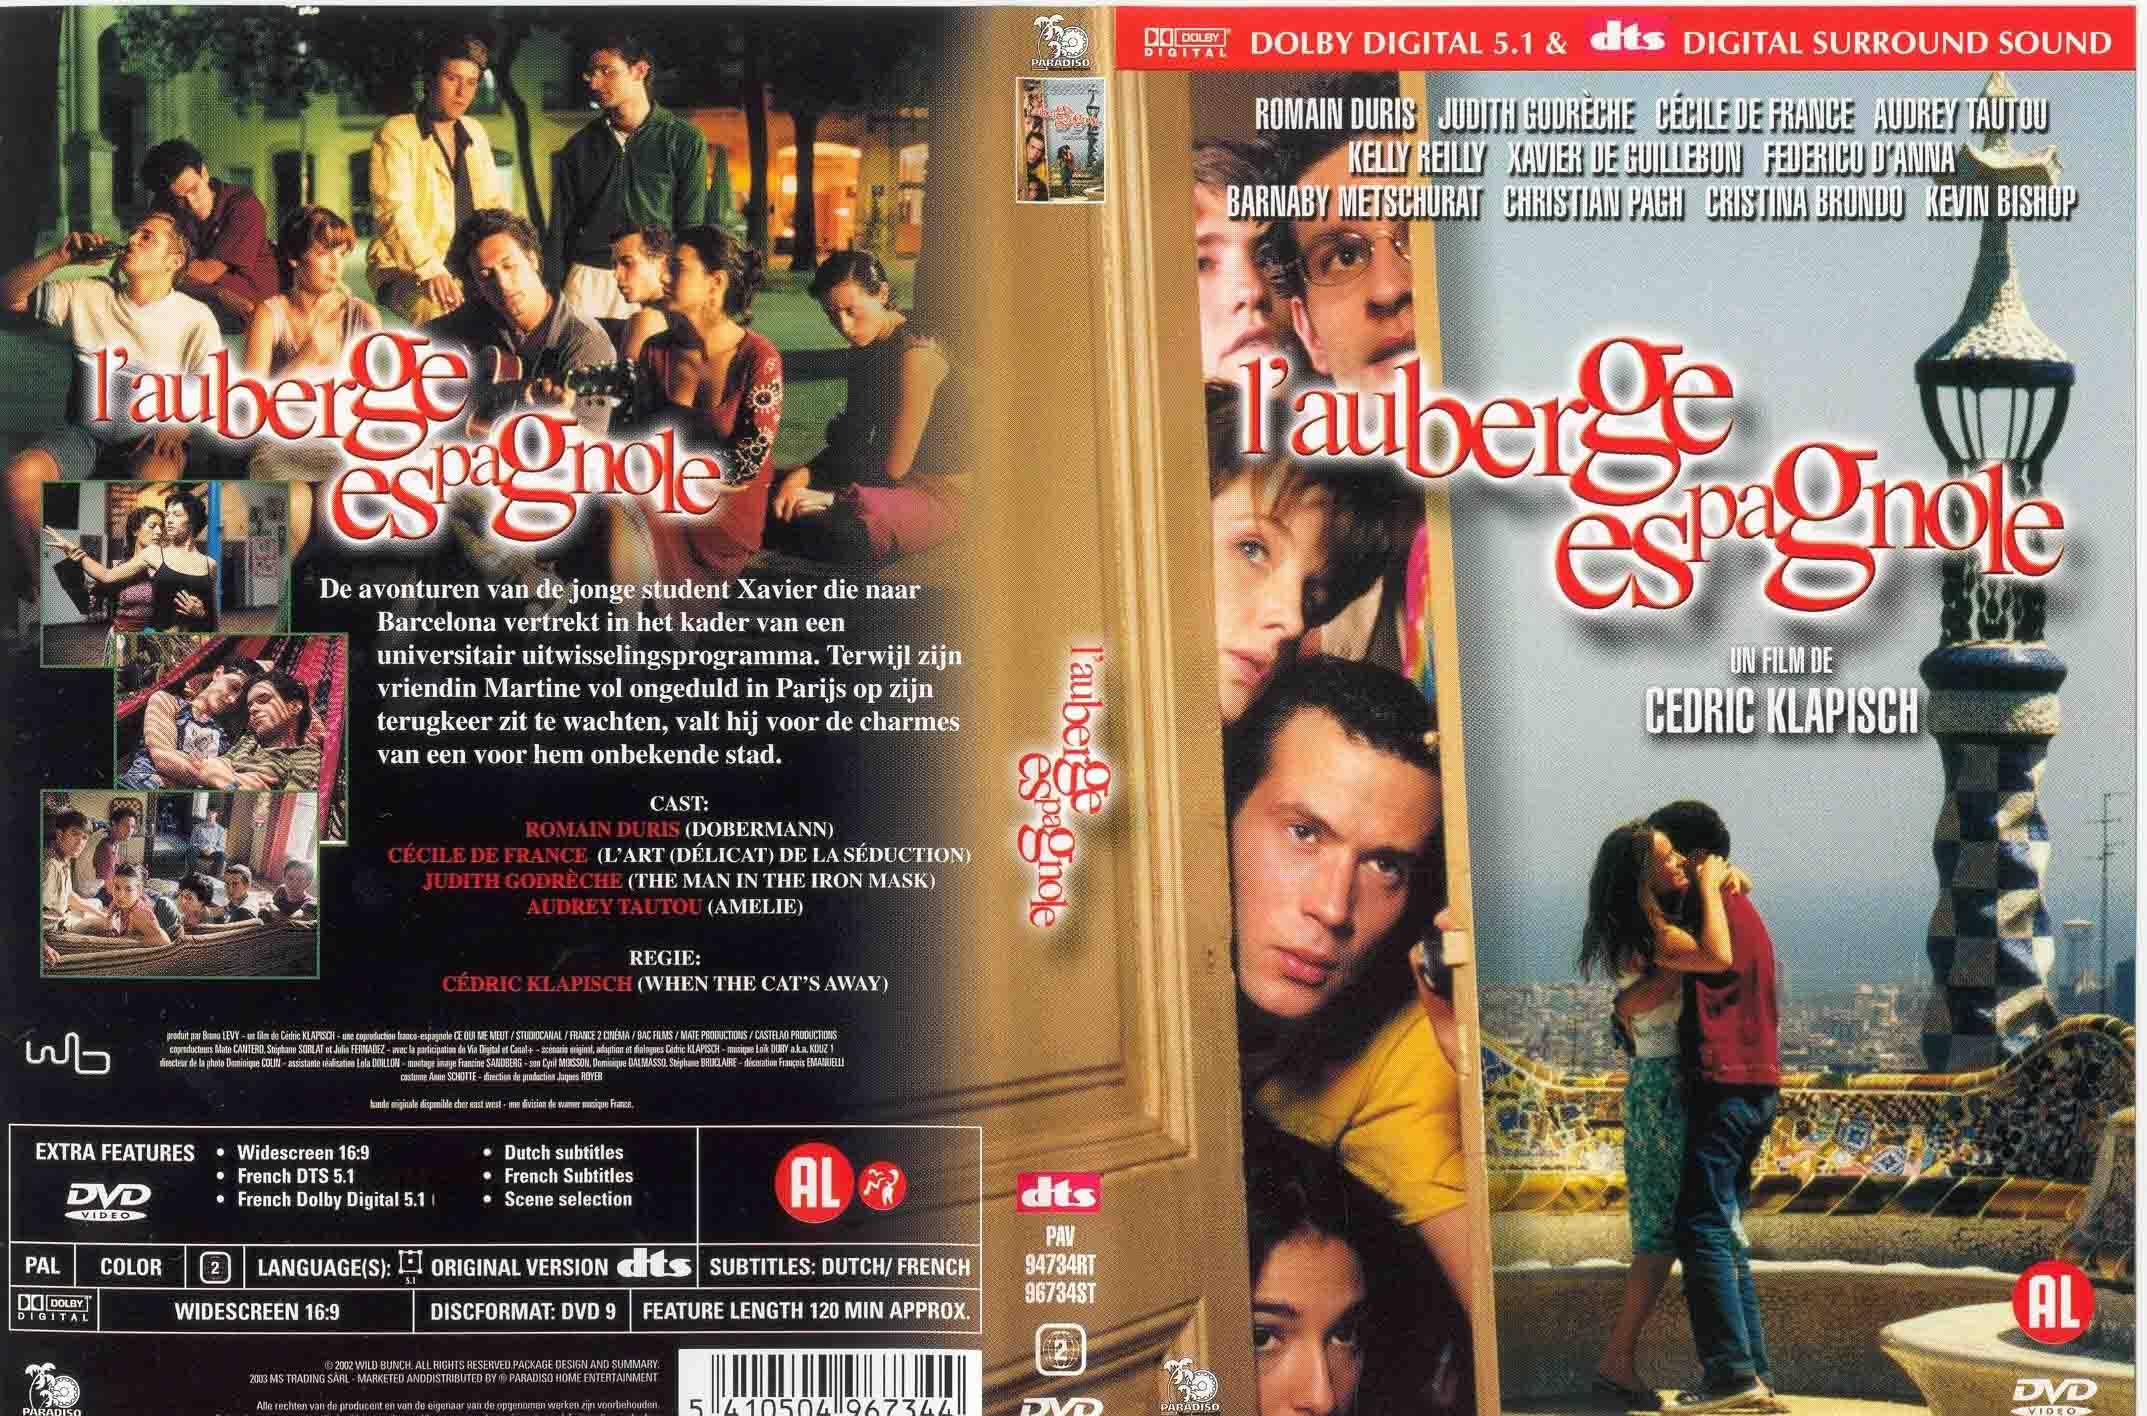 L'Auberge Espagnole (2002) Cédric Klapish L_auberge_espagnole